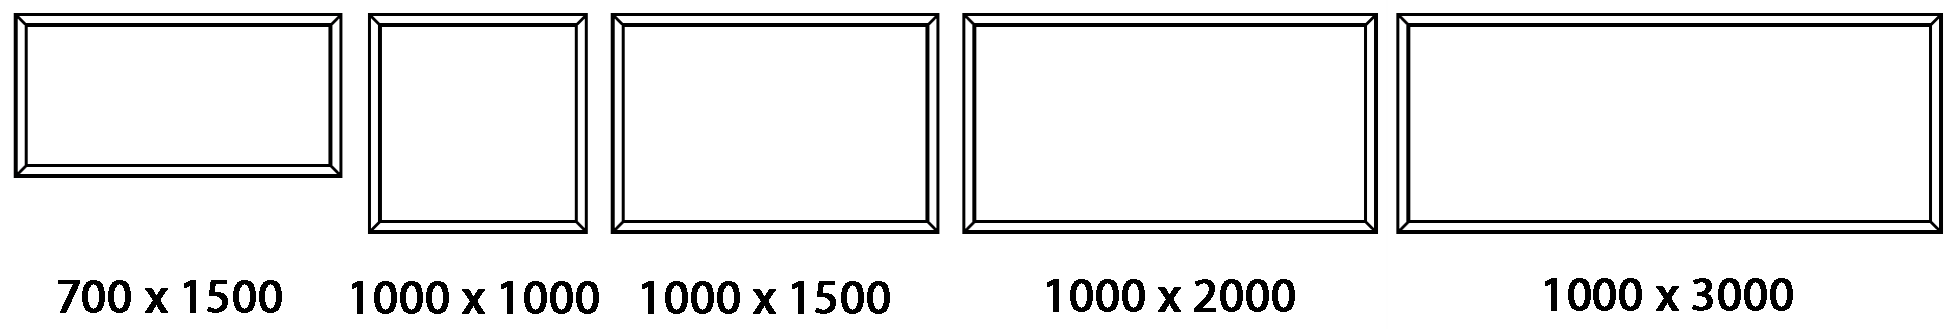 FGR Stock Sizes